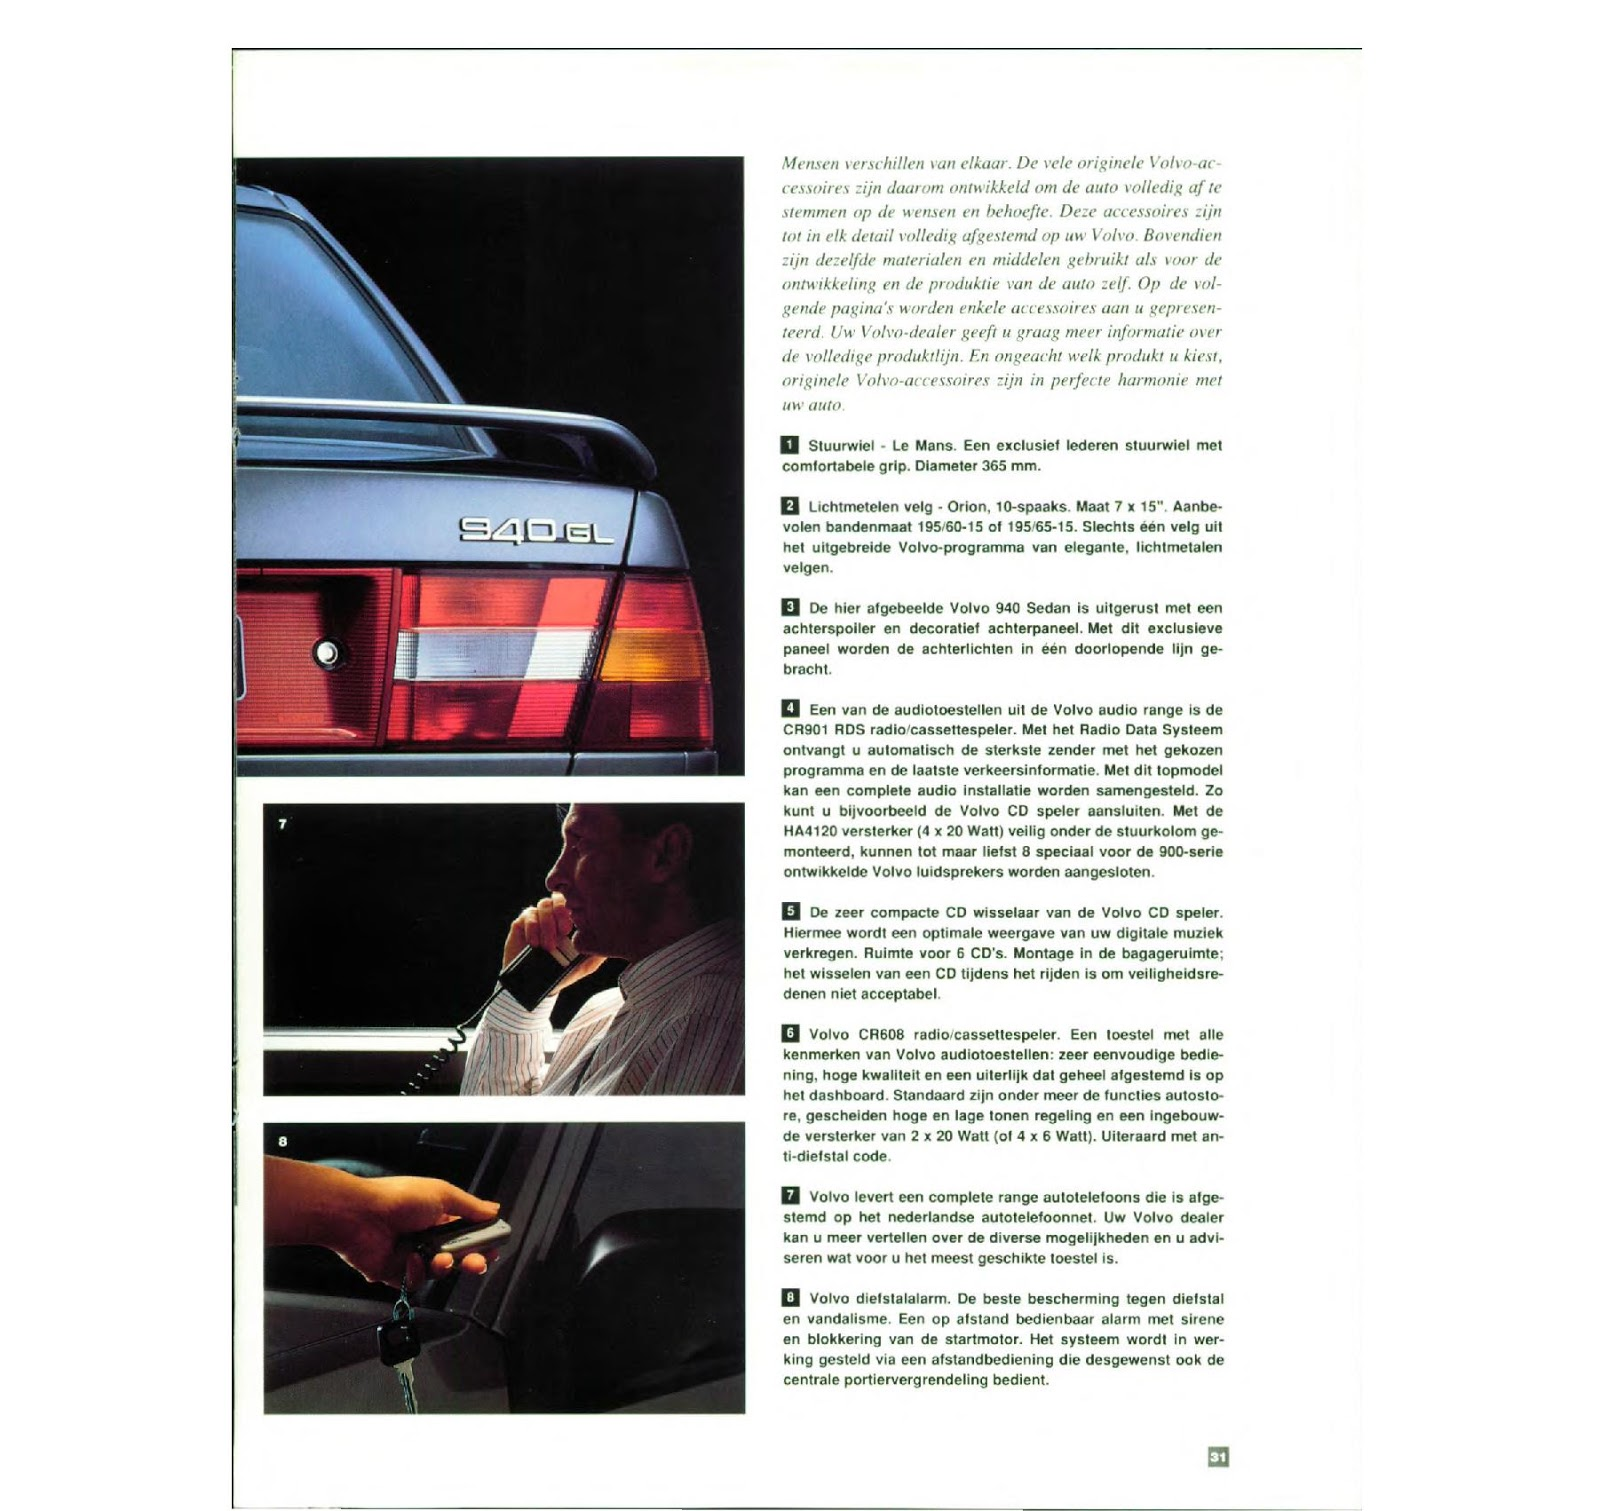 My World Of Volvo 940 Brochure Nl 93 960 Transmission Diagram Dutch Sales 1993